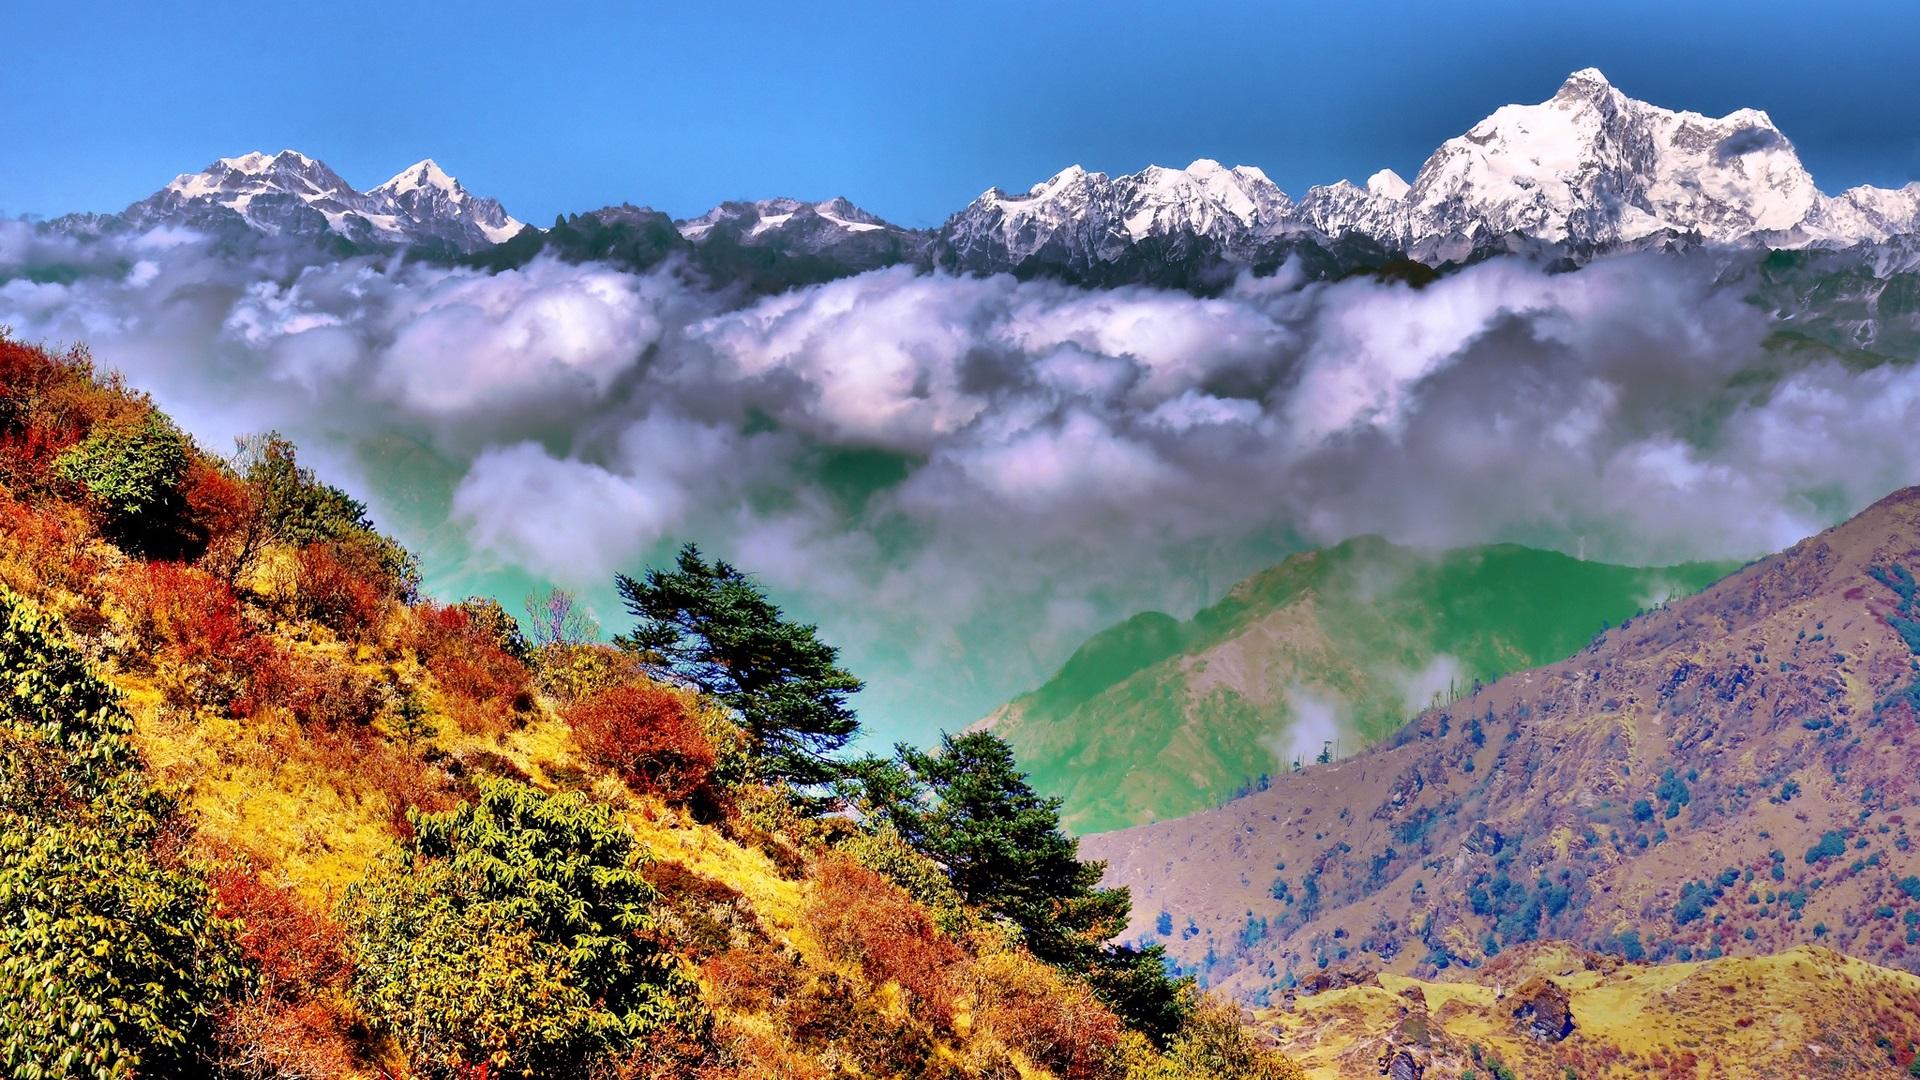 Bandhavgarh National Park Madhya Pradesh India National park pictures in india